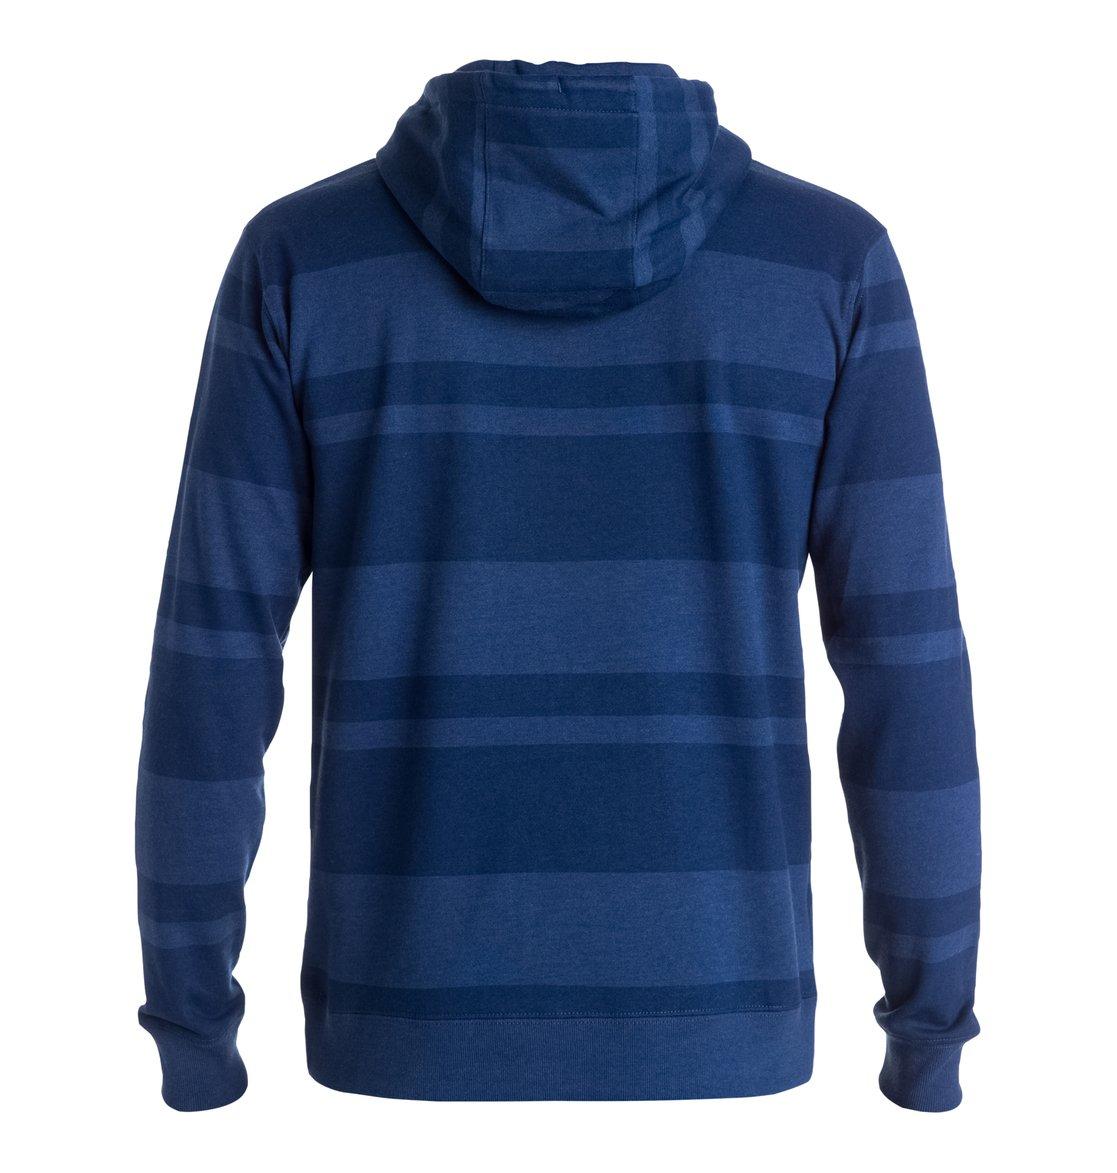 Striped hoodies